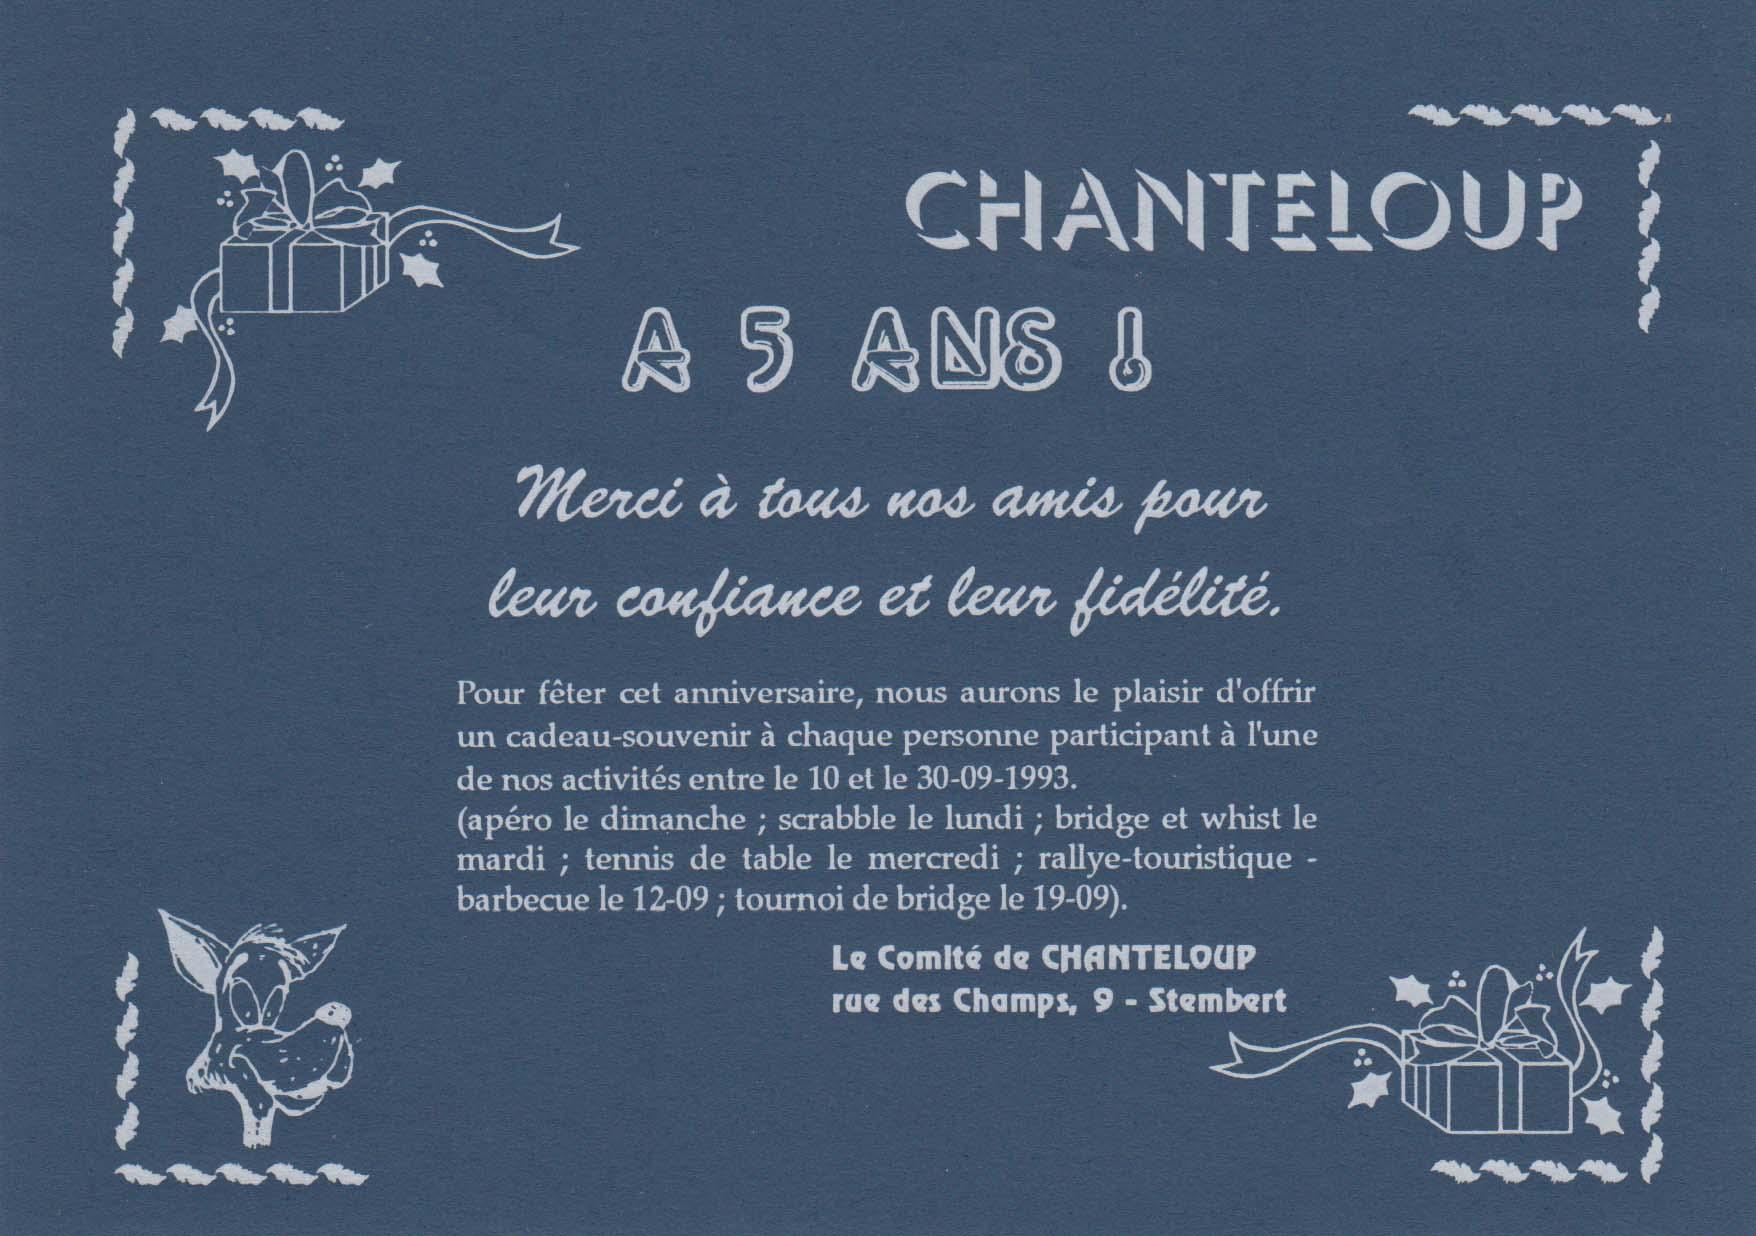 Chanteloup 16